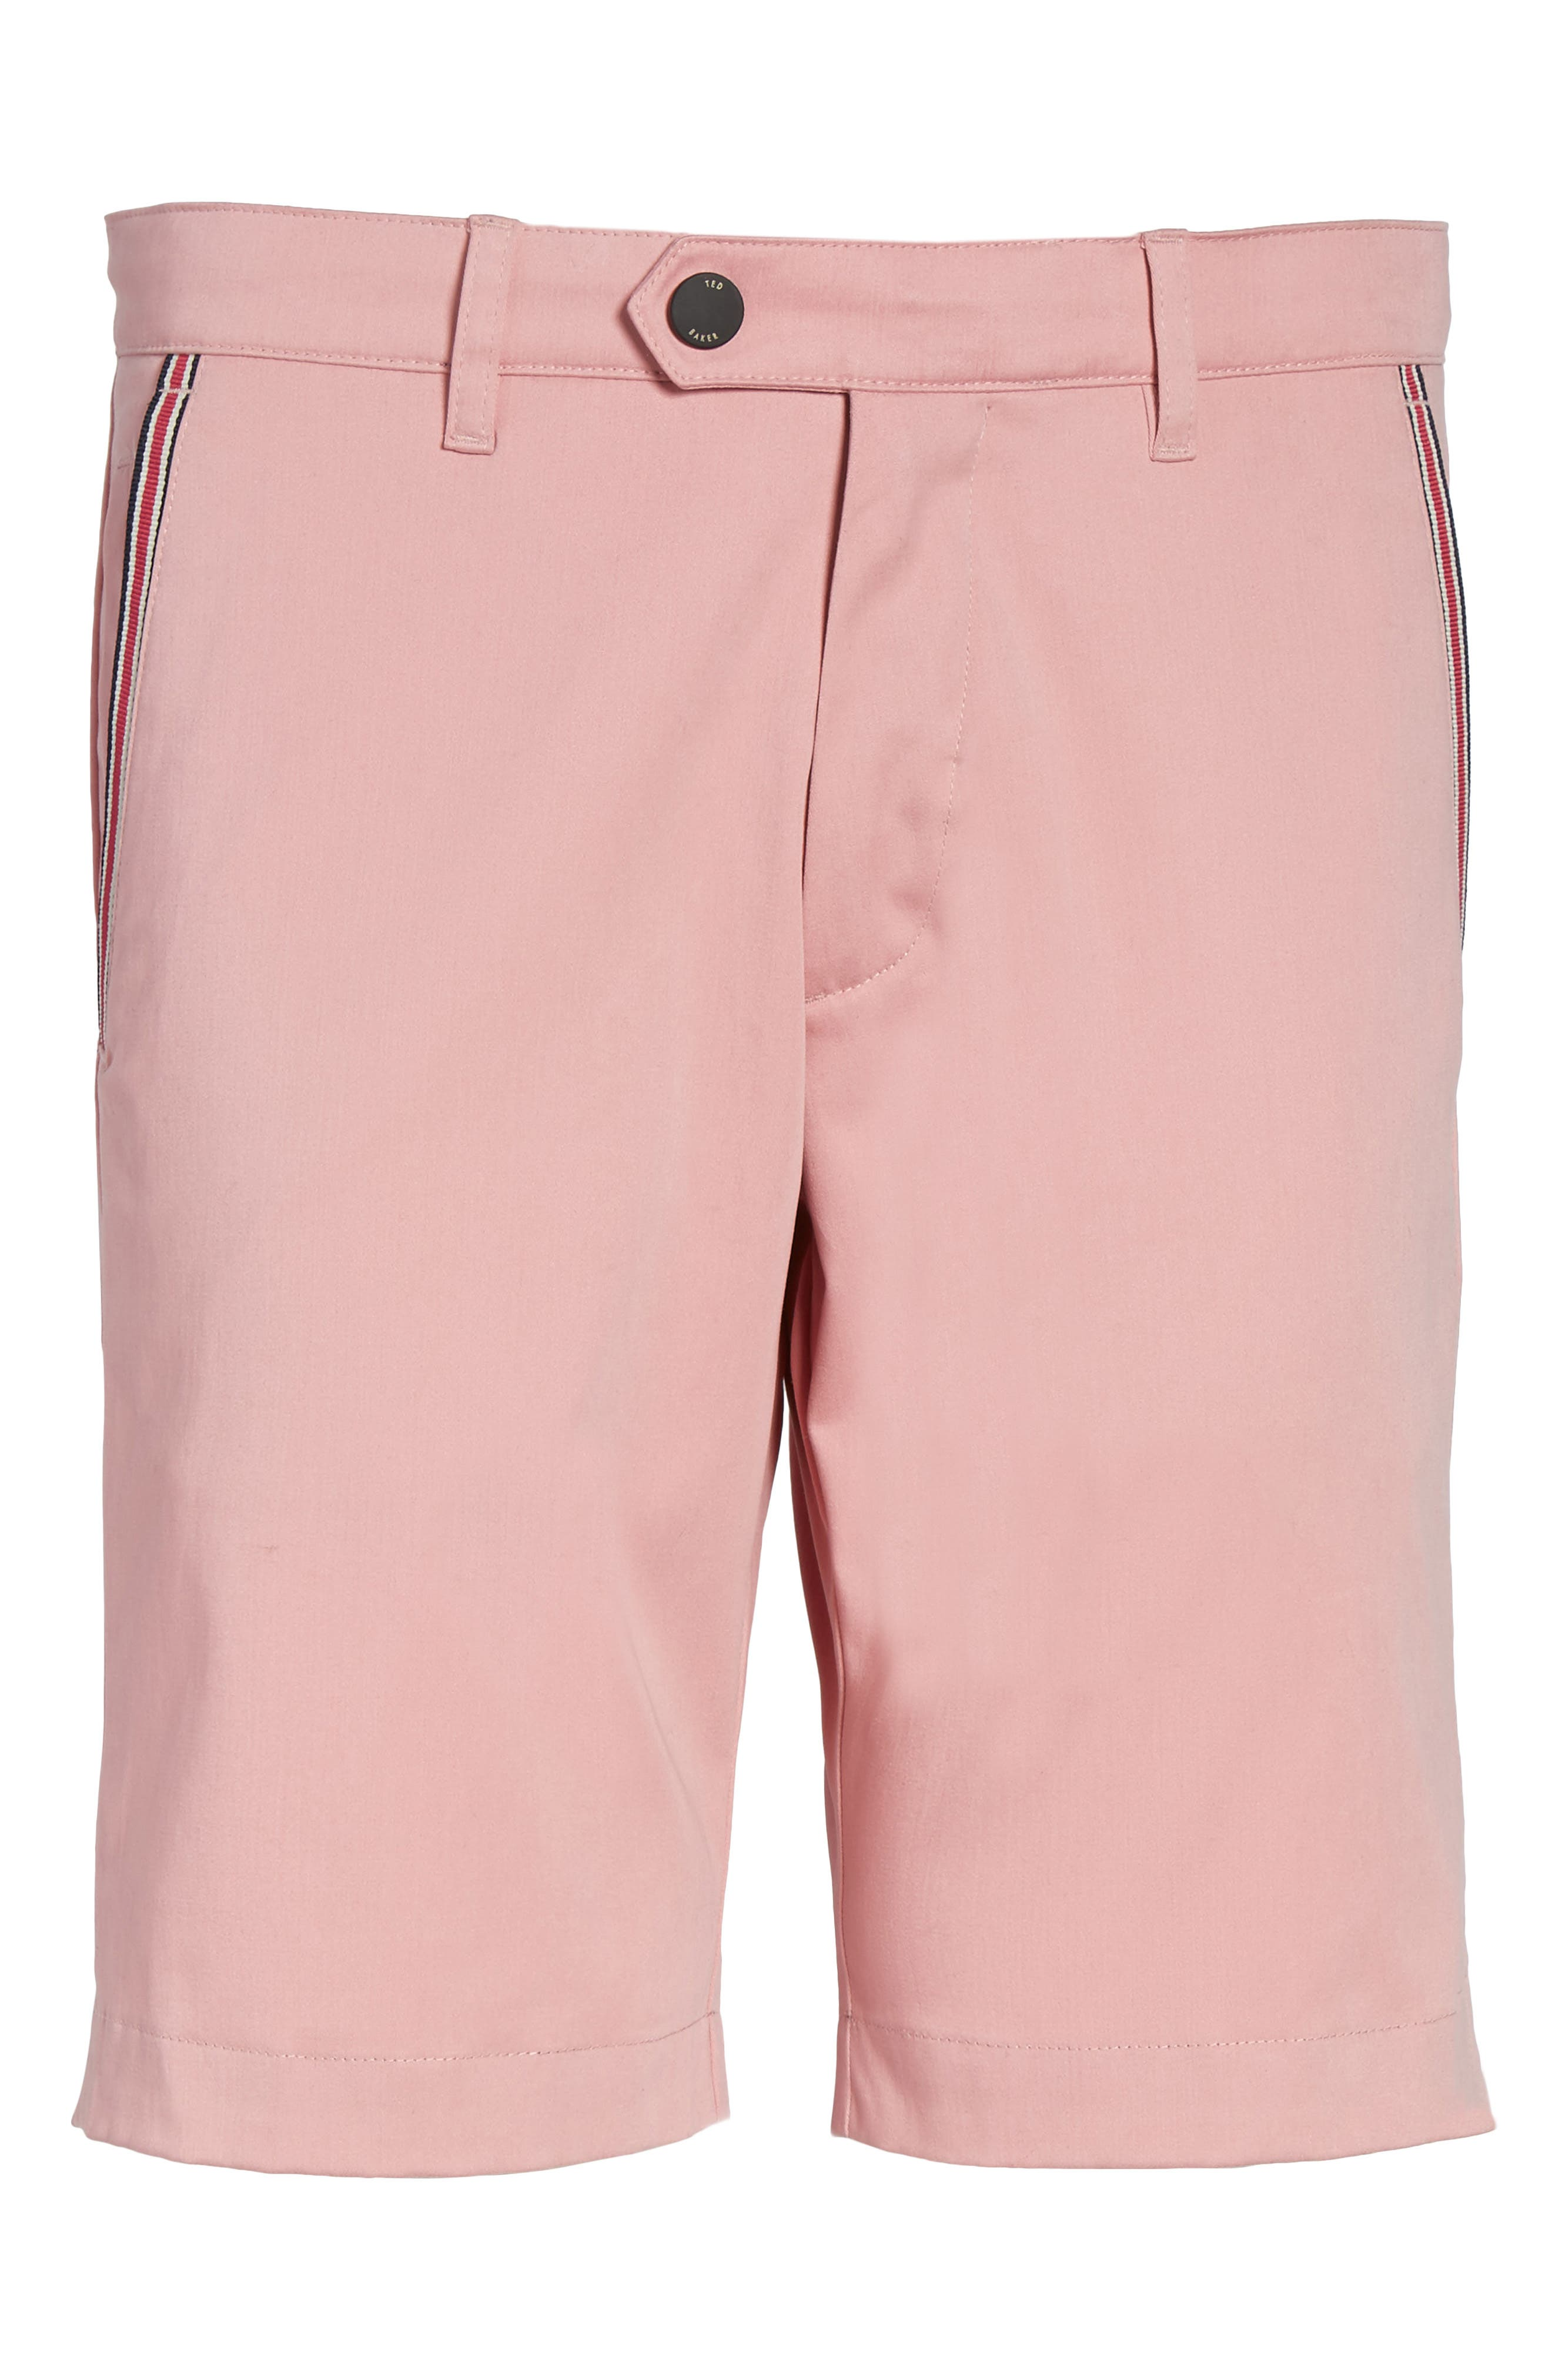 Golf Shorts,                             Alternate thumbnail 18, color,